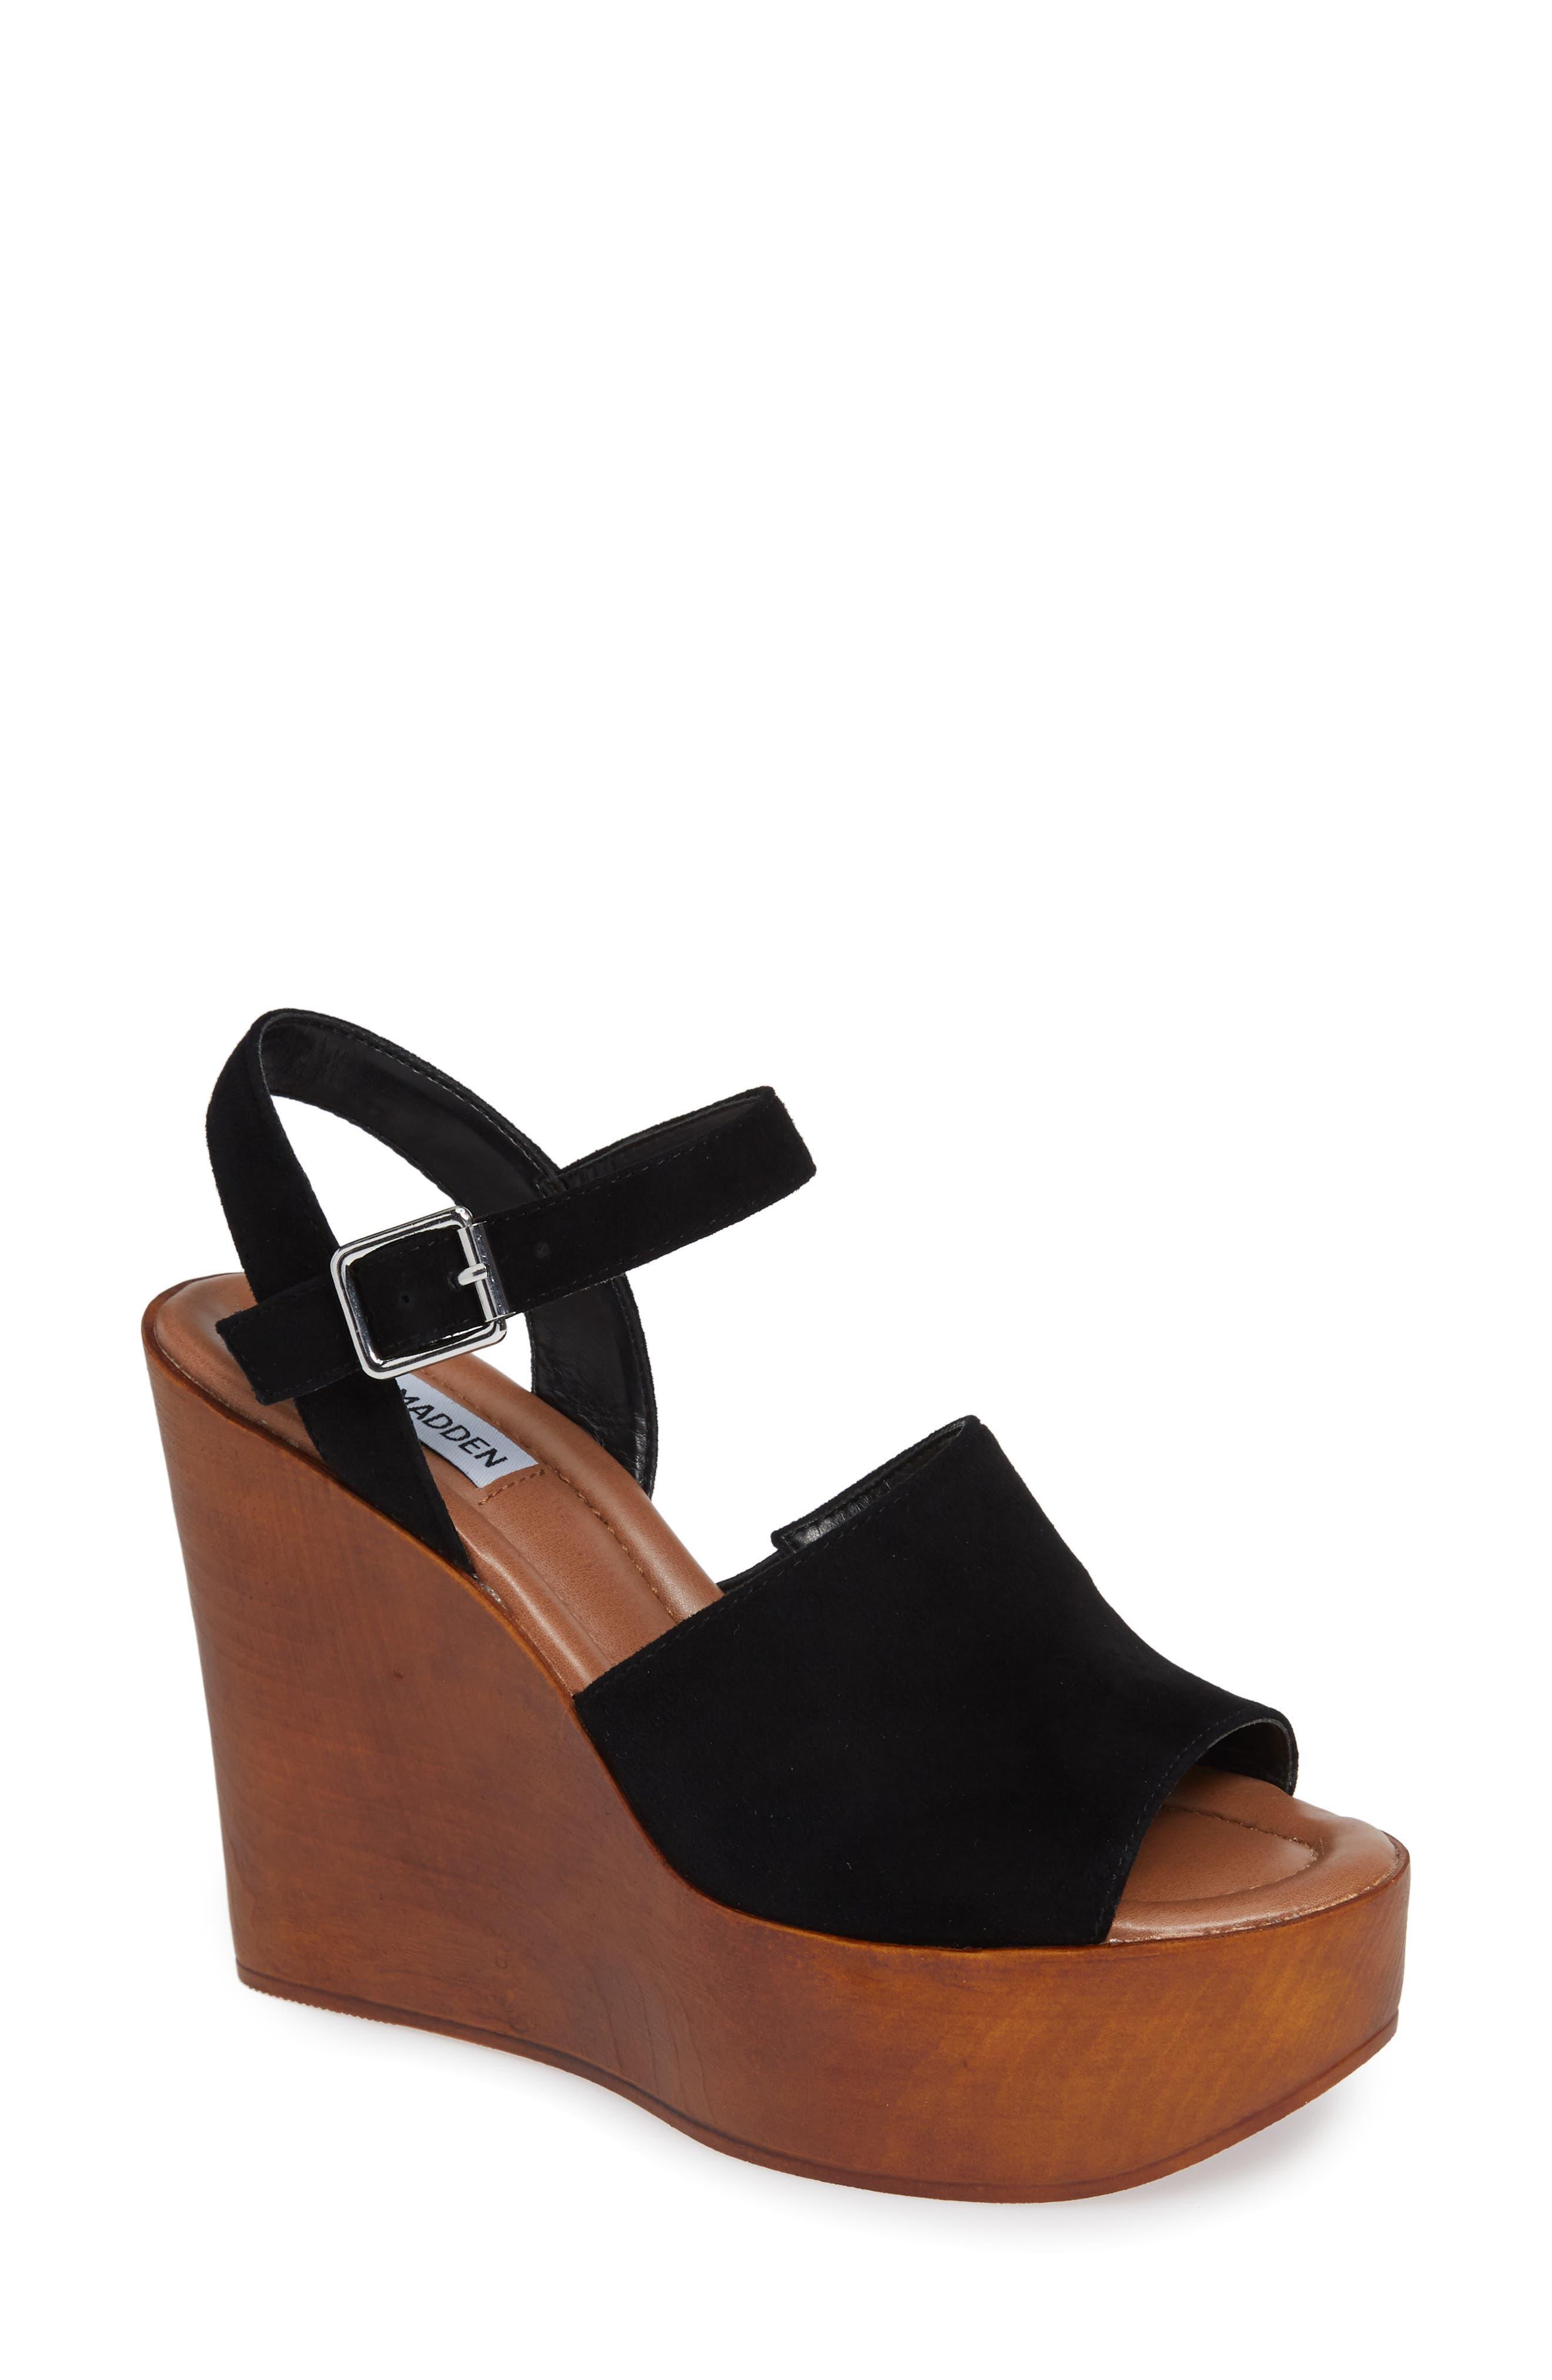 Bellini Wedge Sandal,                             Main thumbnail 1, color,                             BLACK SUEDE